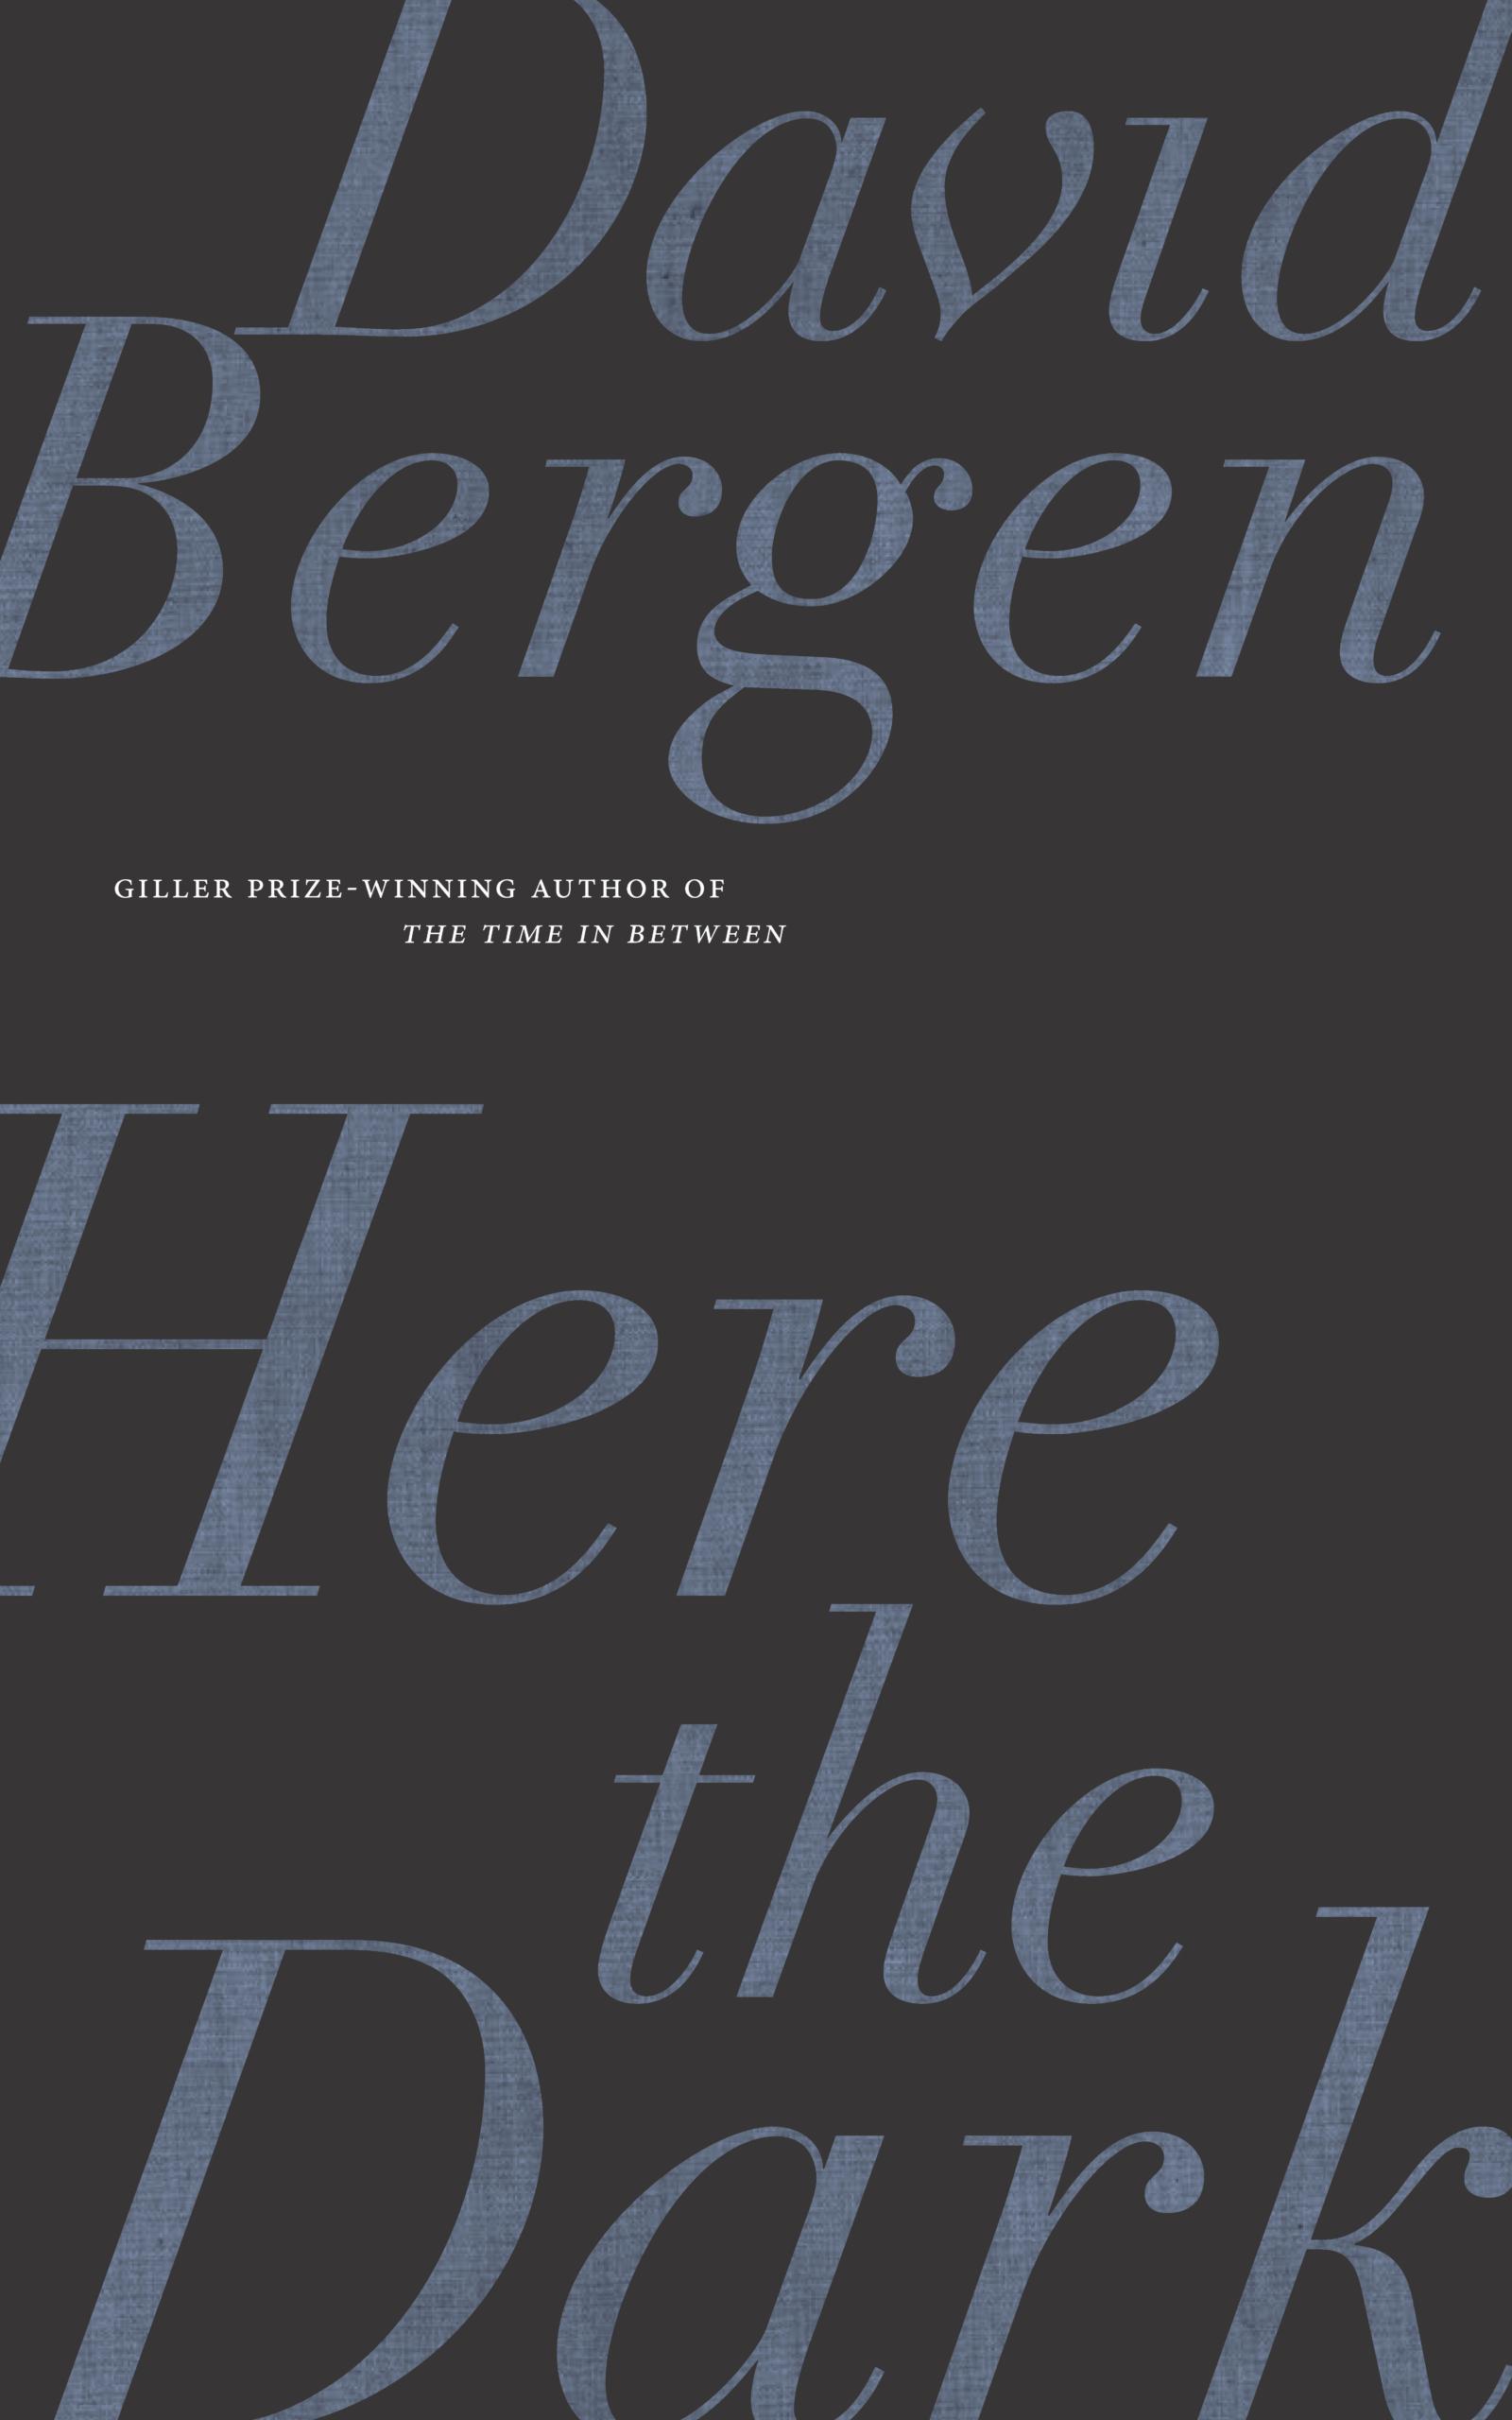 BergenDavid Here the Dark BookCover